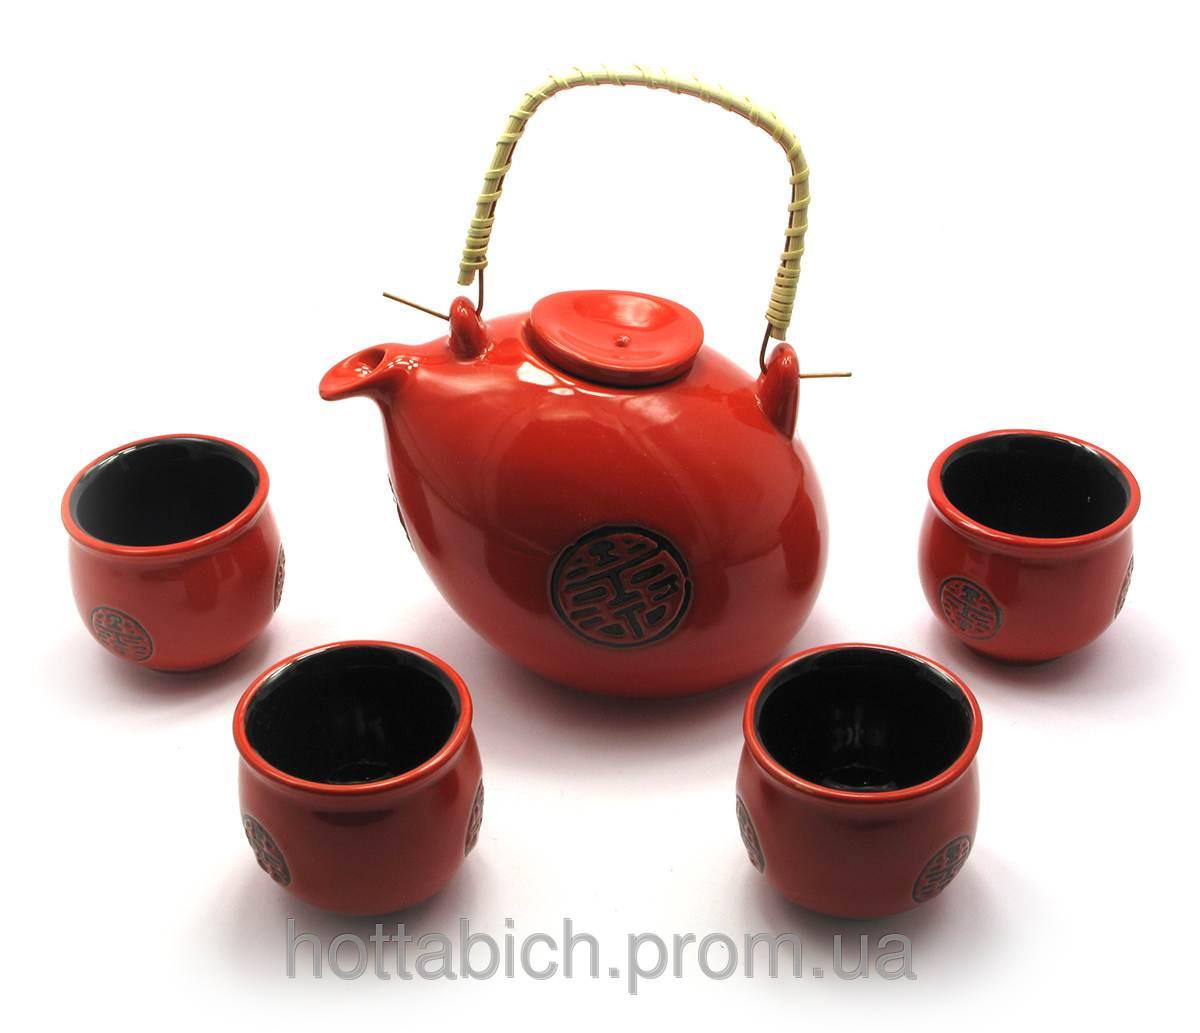 Красный чайный сервиз чайник, 4 чашки